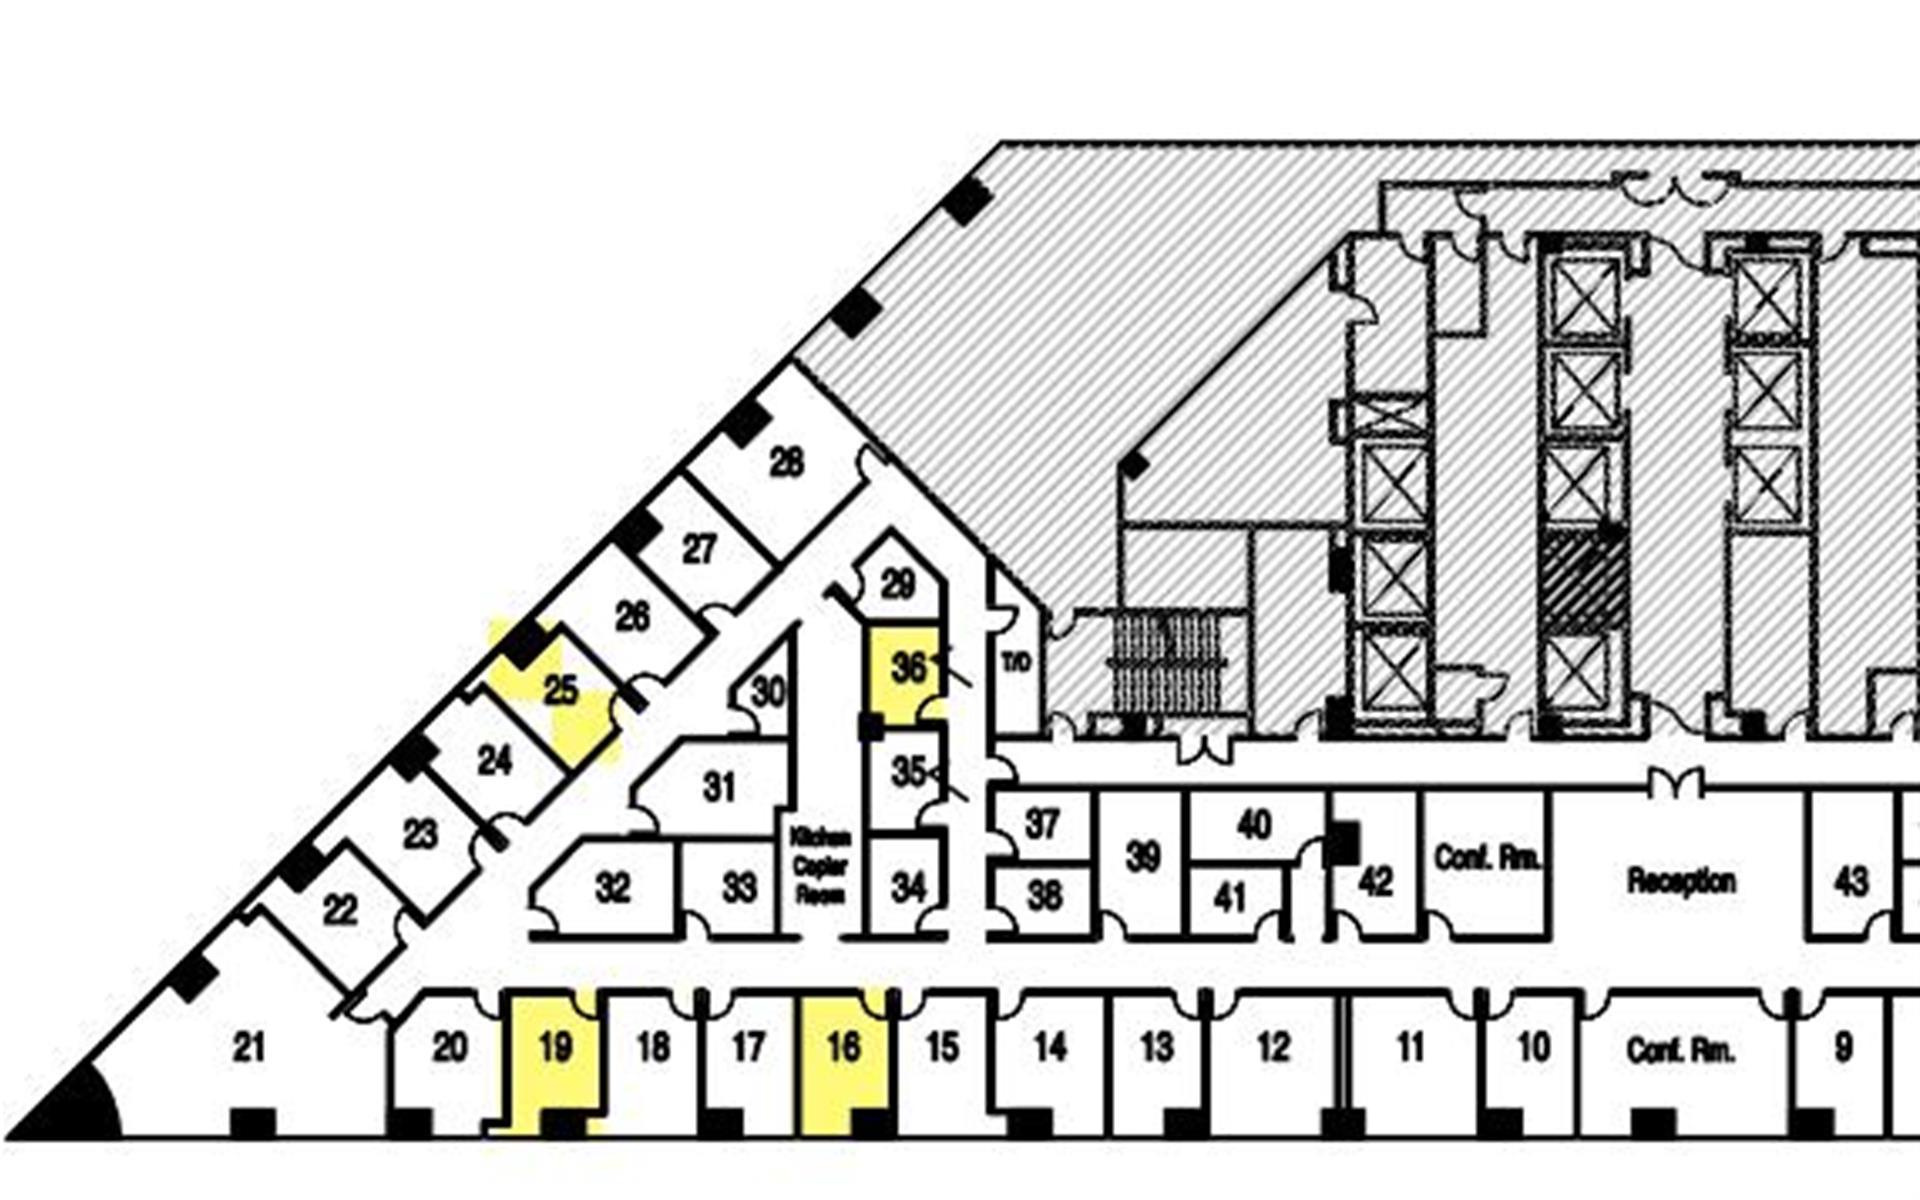 (355) Wells Fargo Center - Multiple Suites - 17 people